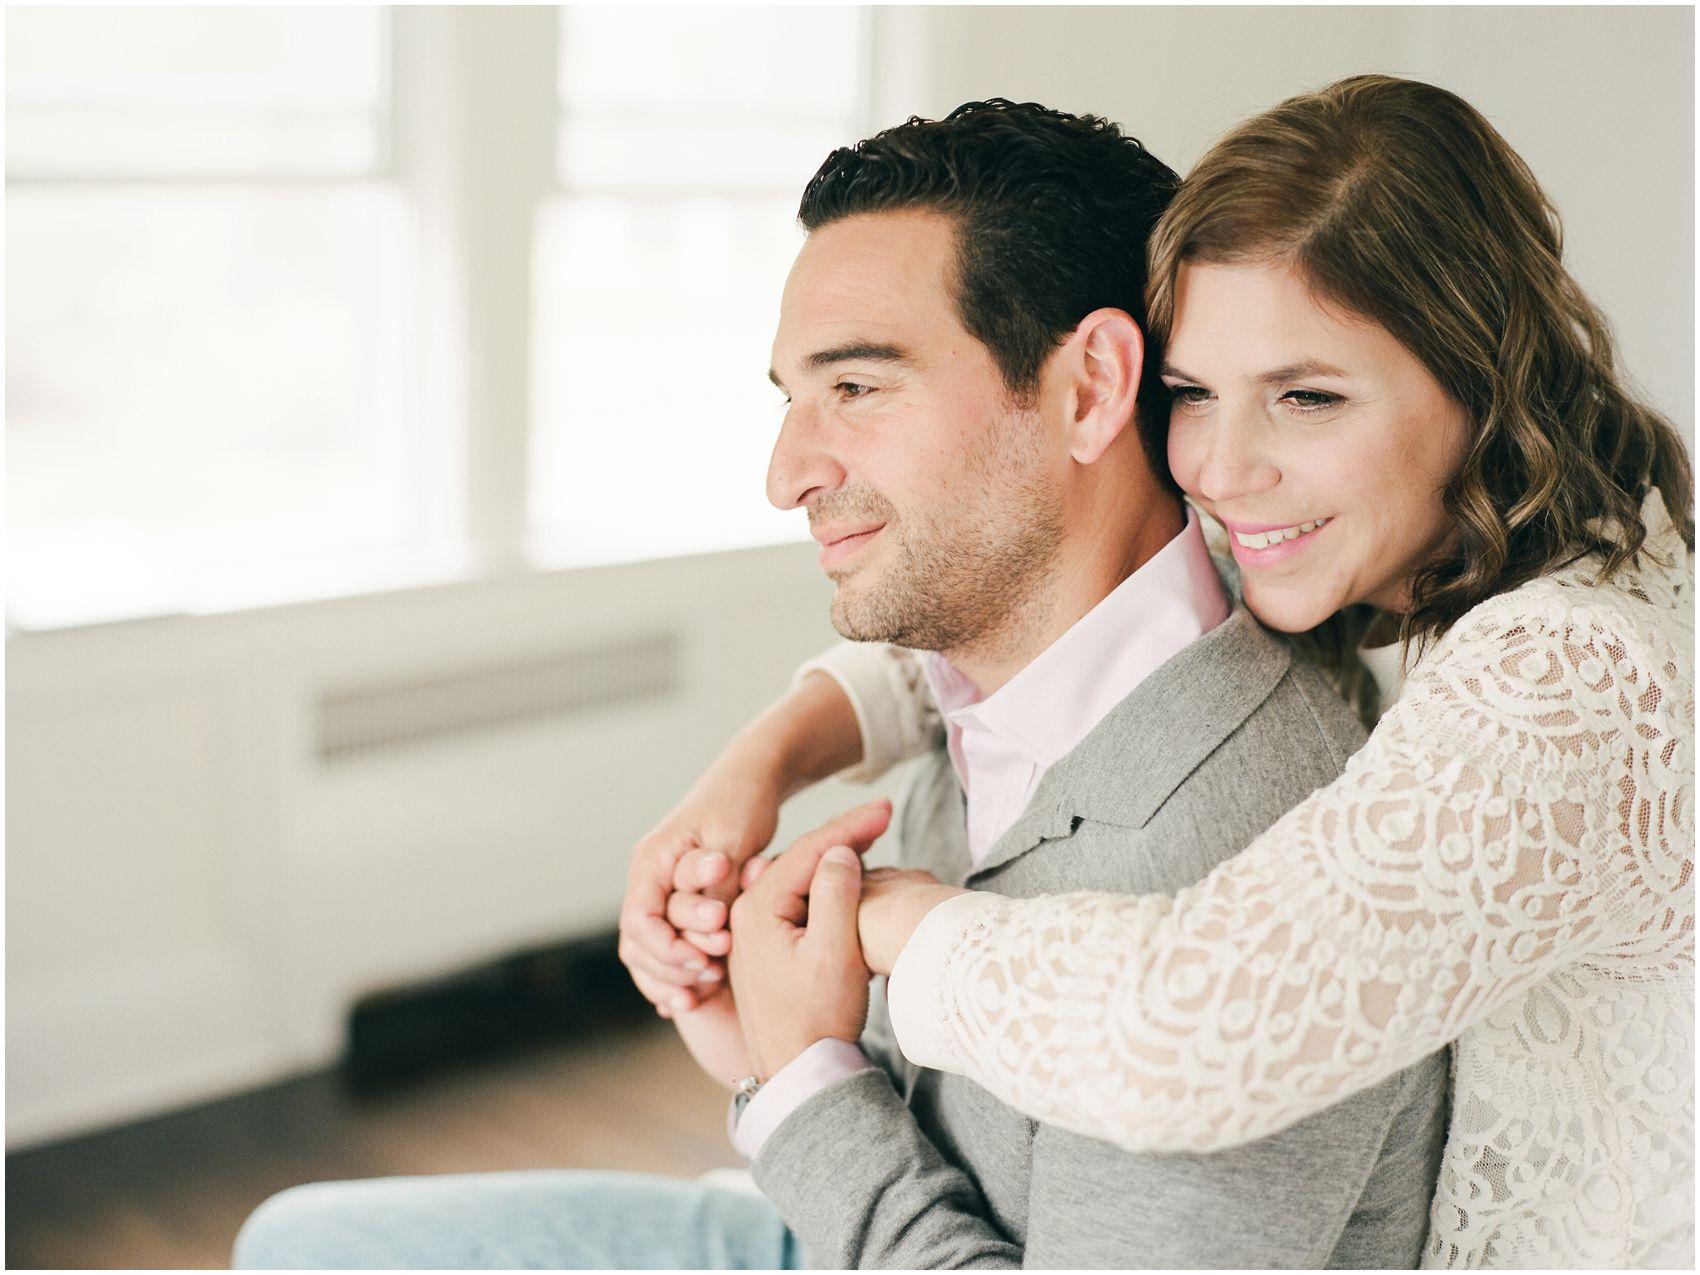 engagement session photos